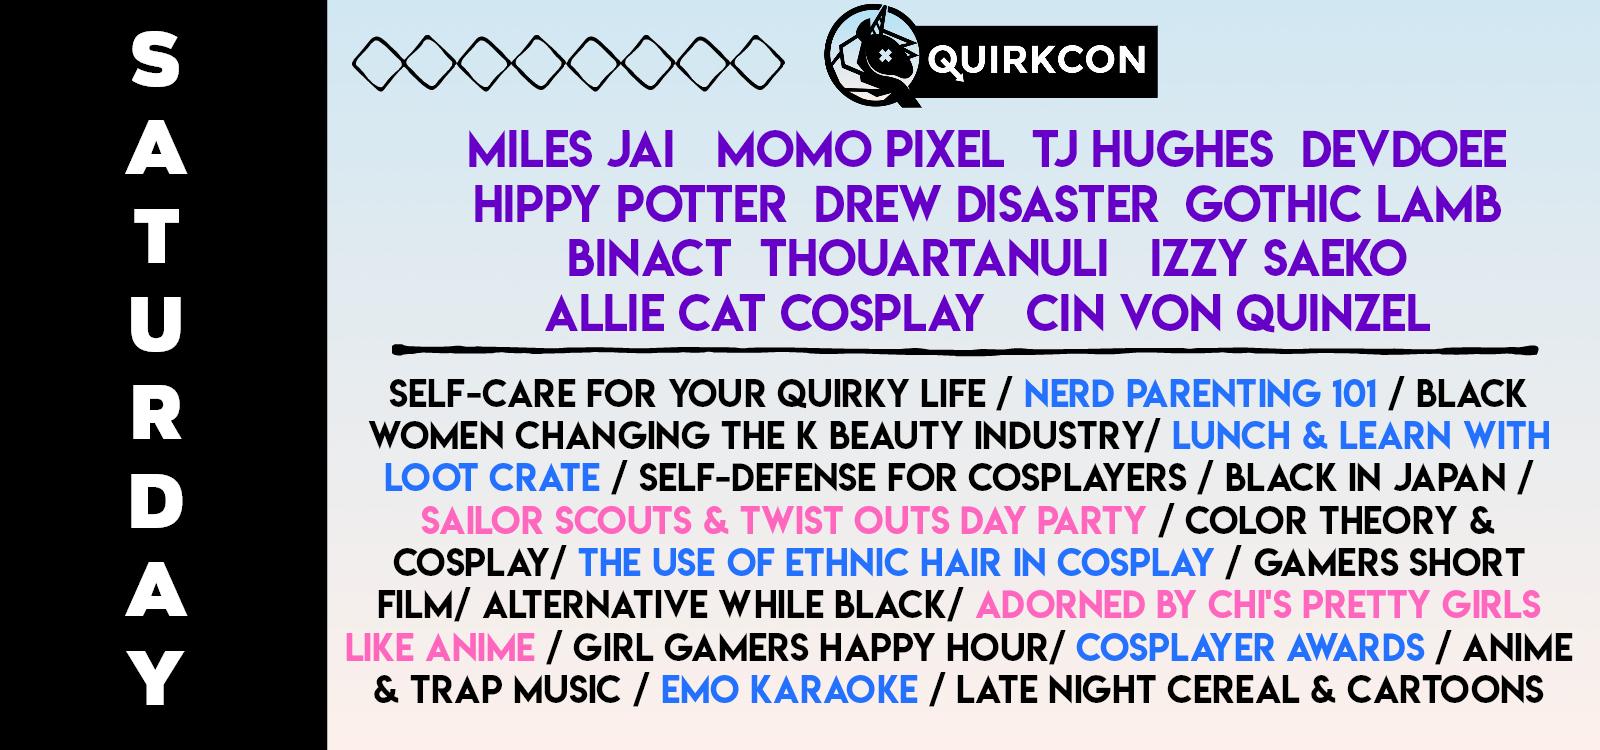 QuirkCon Saturday Full Schedule.jpg